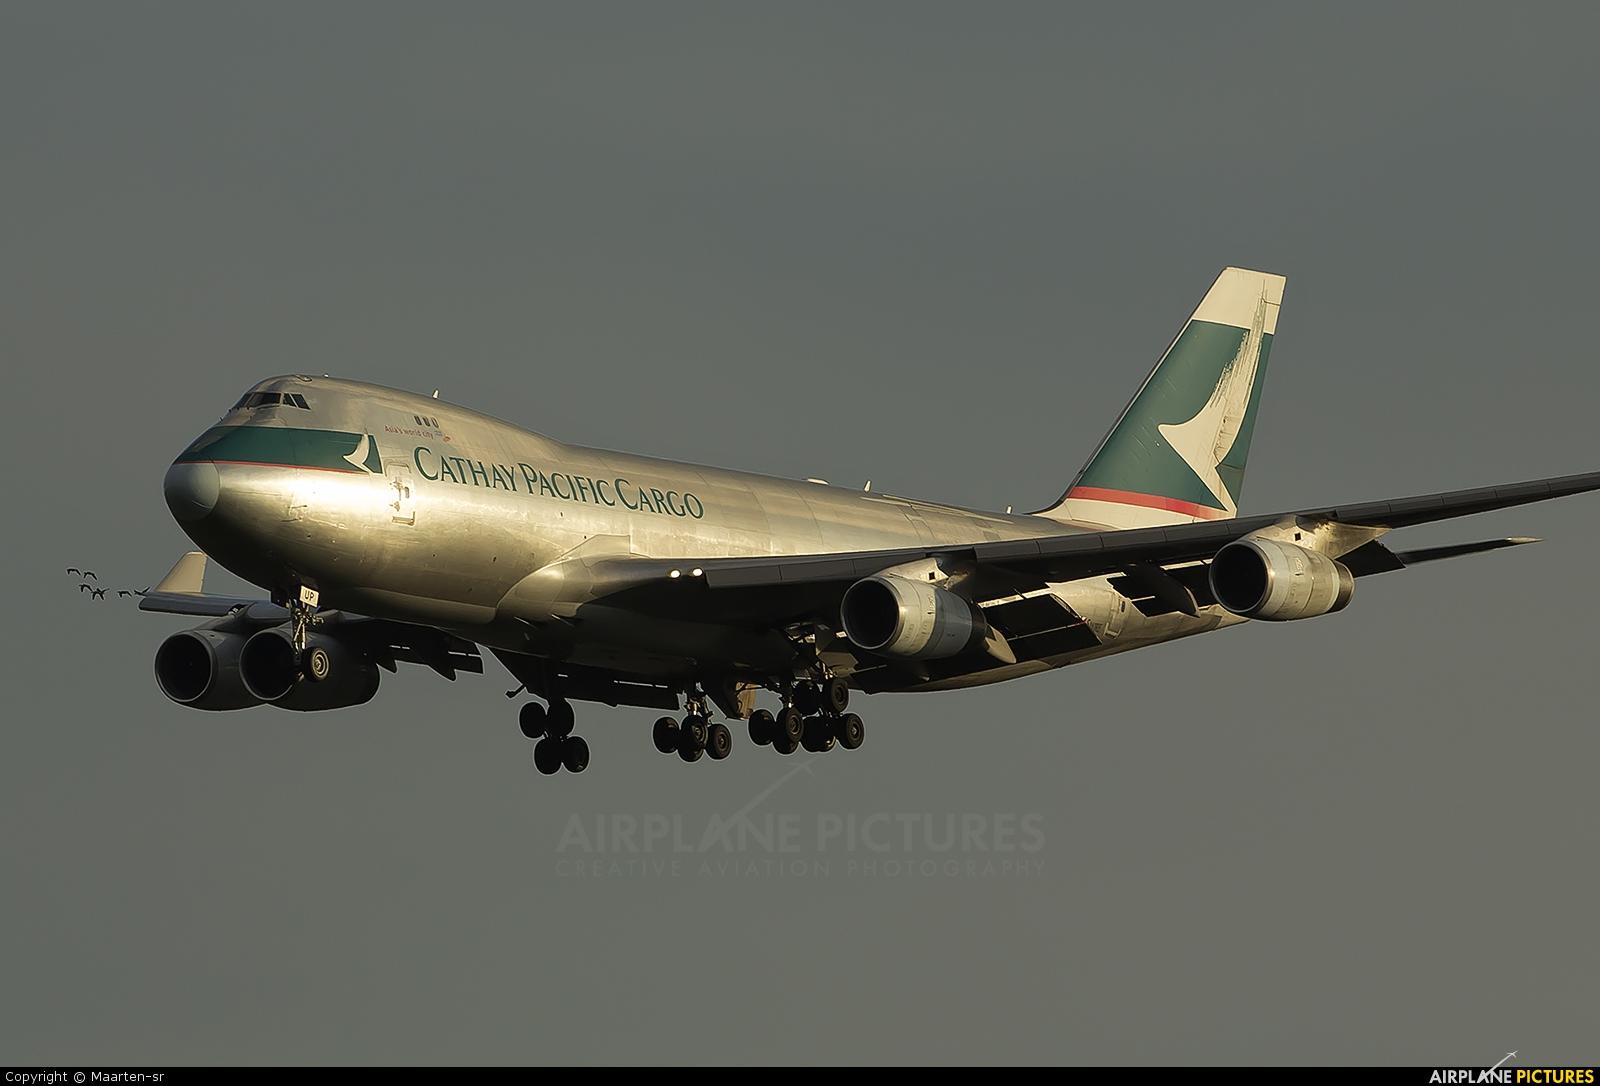 Cathay Pacific Cargo B-HUP aircraft at Amsterdam - Schiphol